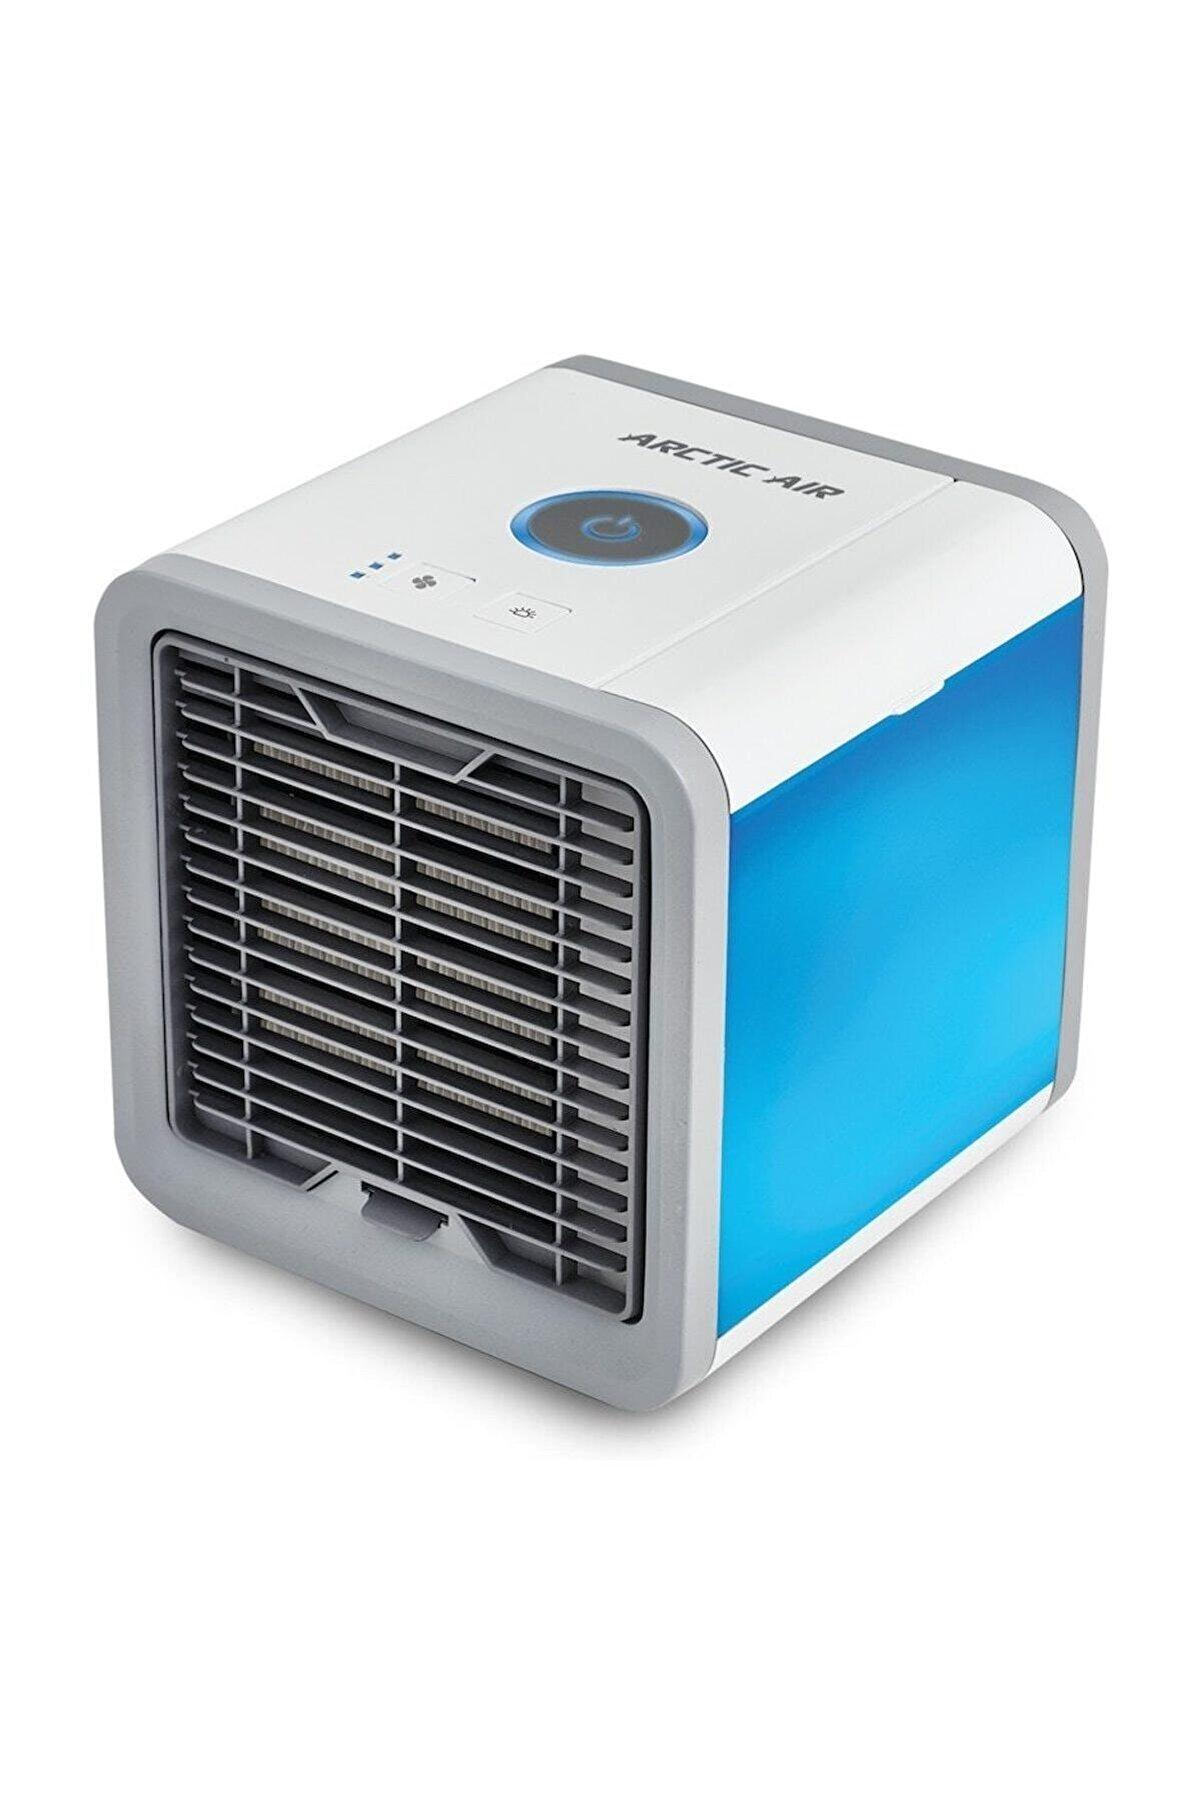 checkmate Artic Air Mini Klima Hava Soğutucu 3kdemeli Usb Vantilatör Yerine